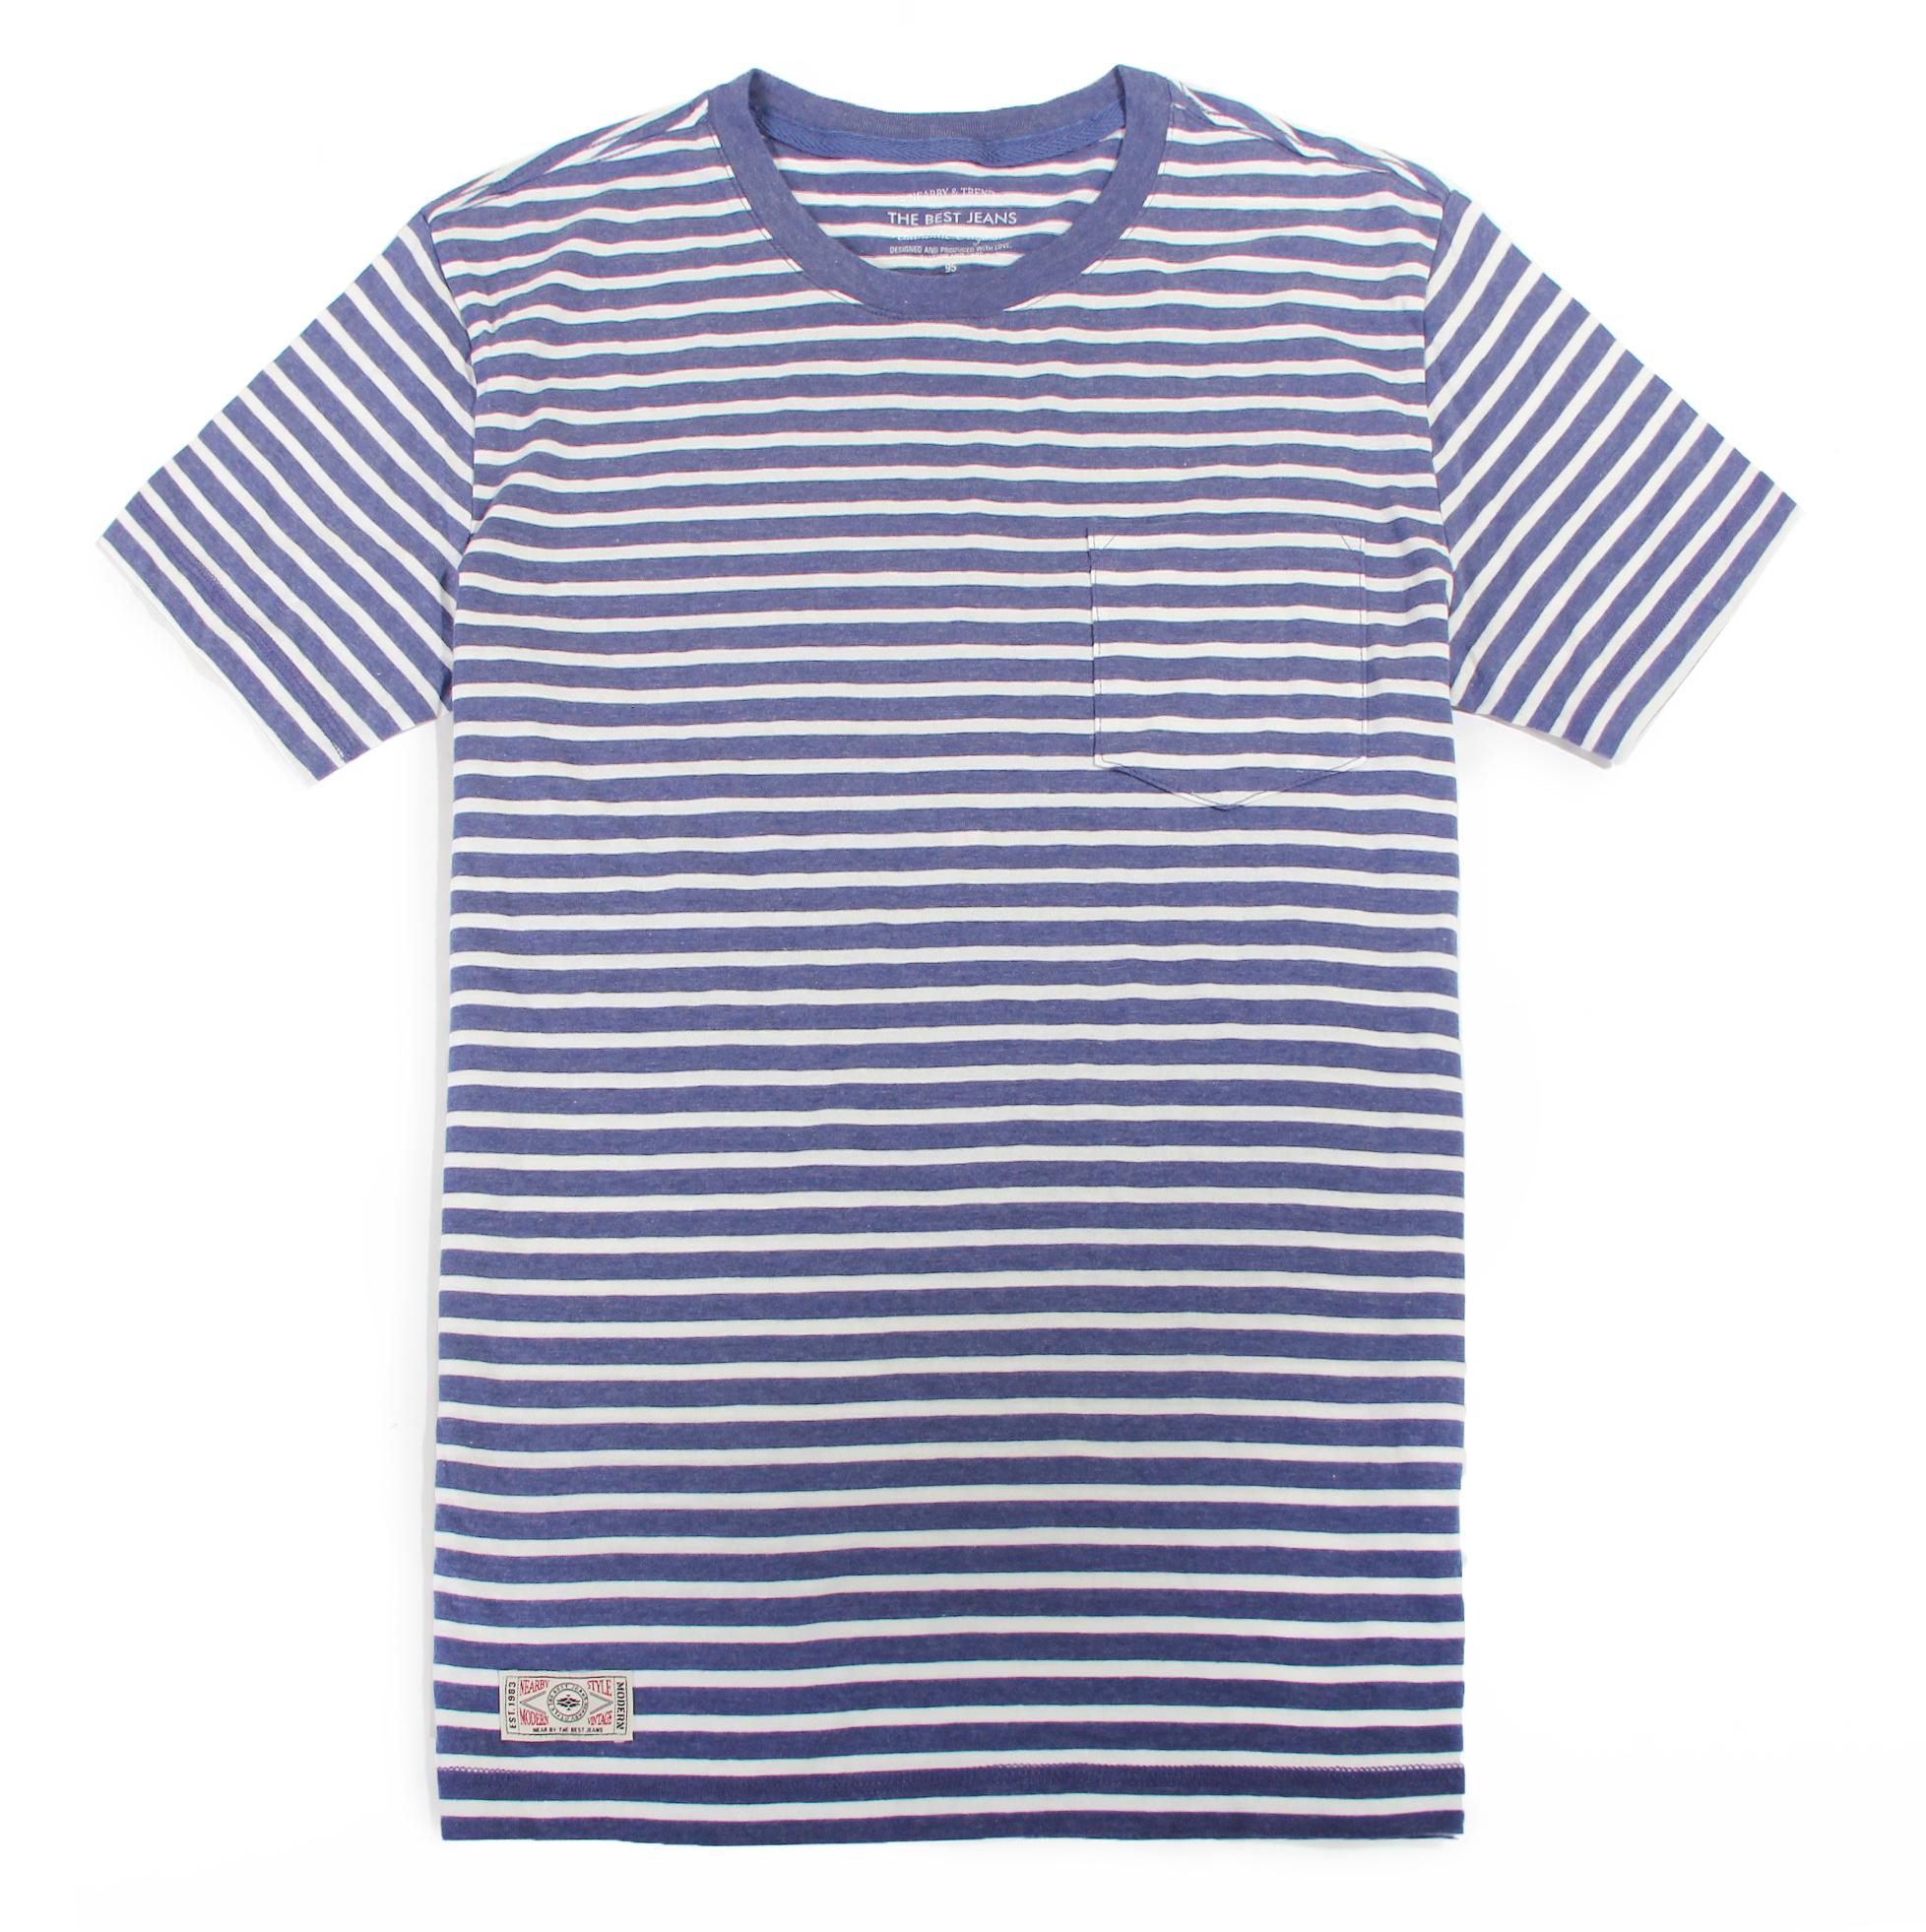 Shop Phan_3t Hàng VNXK origianal !!Zara,celio,nautica,raul lauren...Giá tốt nhất!! - 22